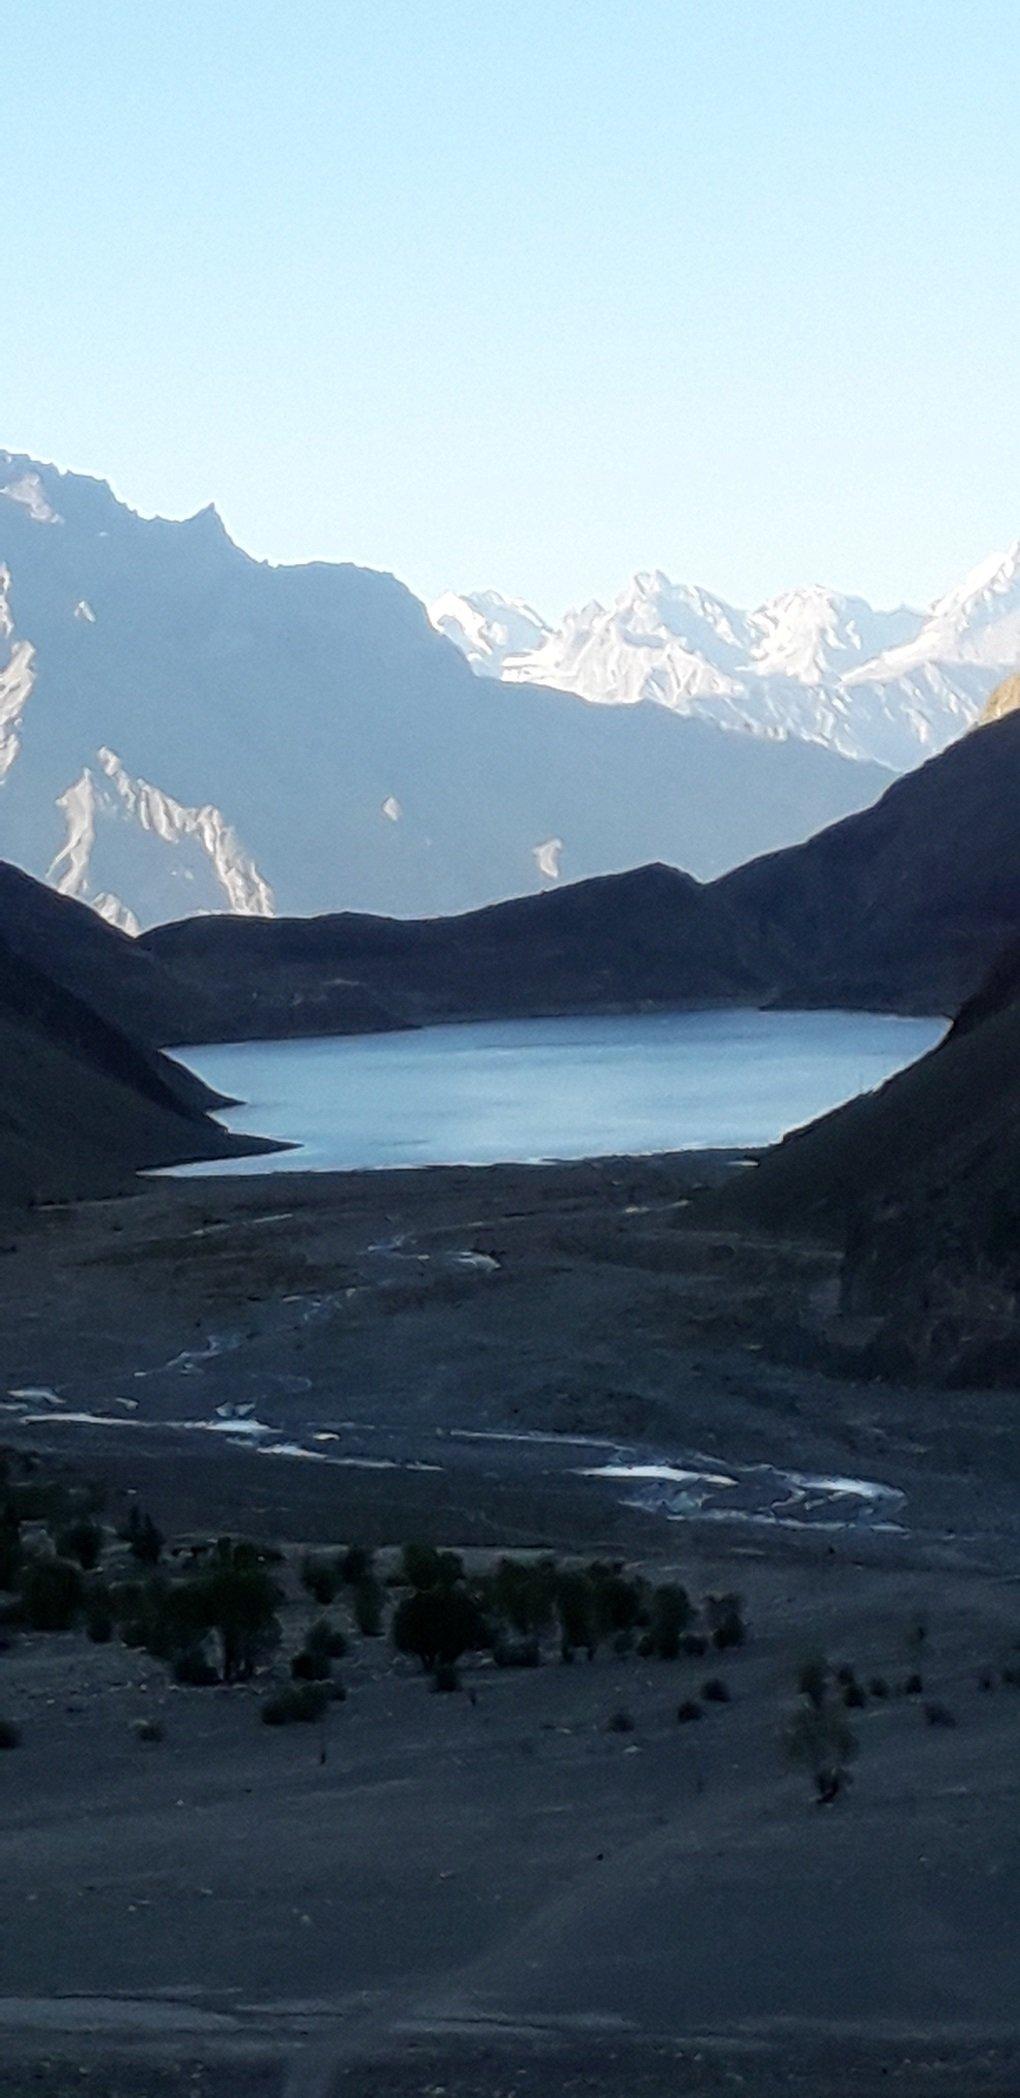 Sadpara lake [image by: Shabina Faraz]